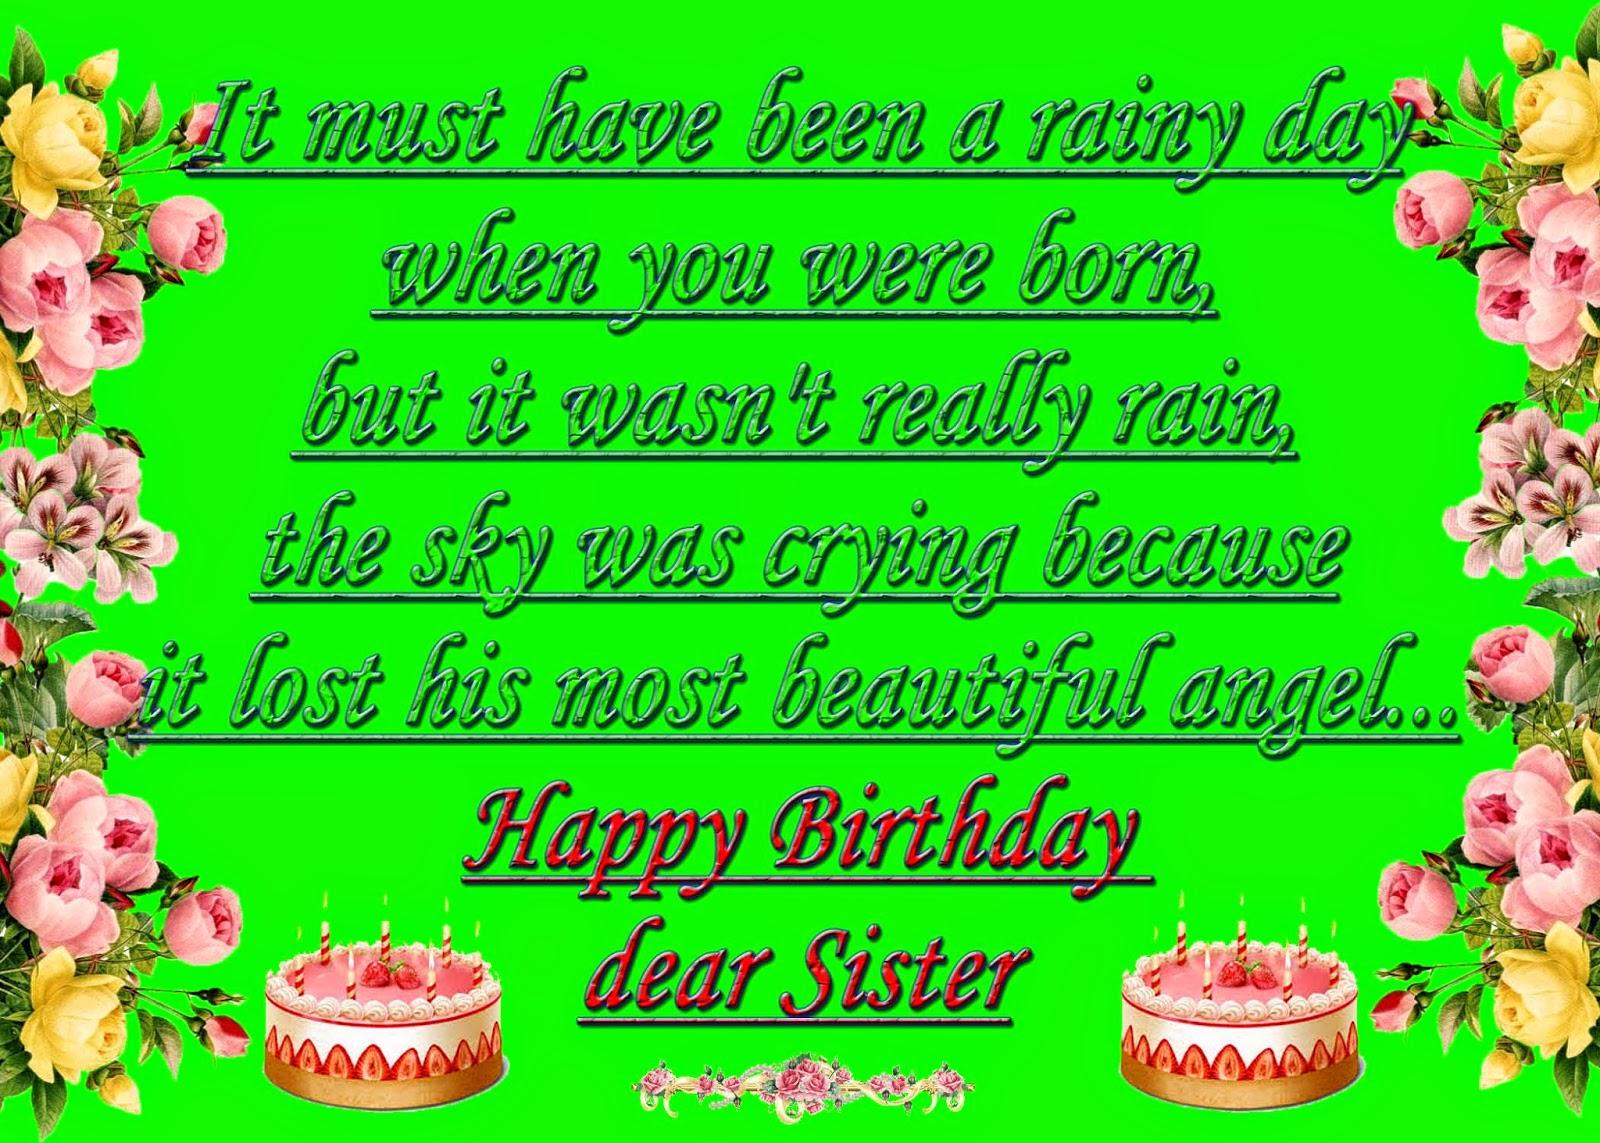 Birthday Greetings To My Sister Choice Image Greetings Card Design